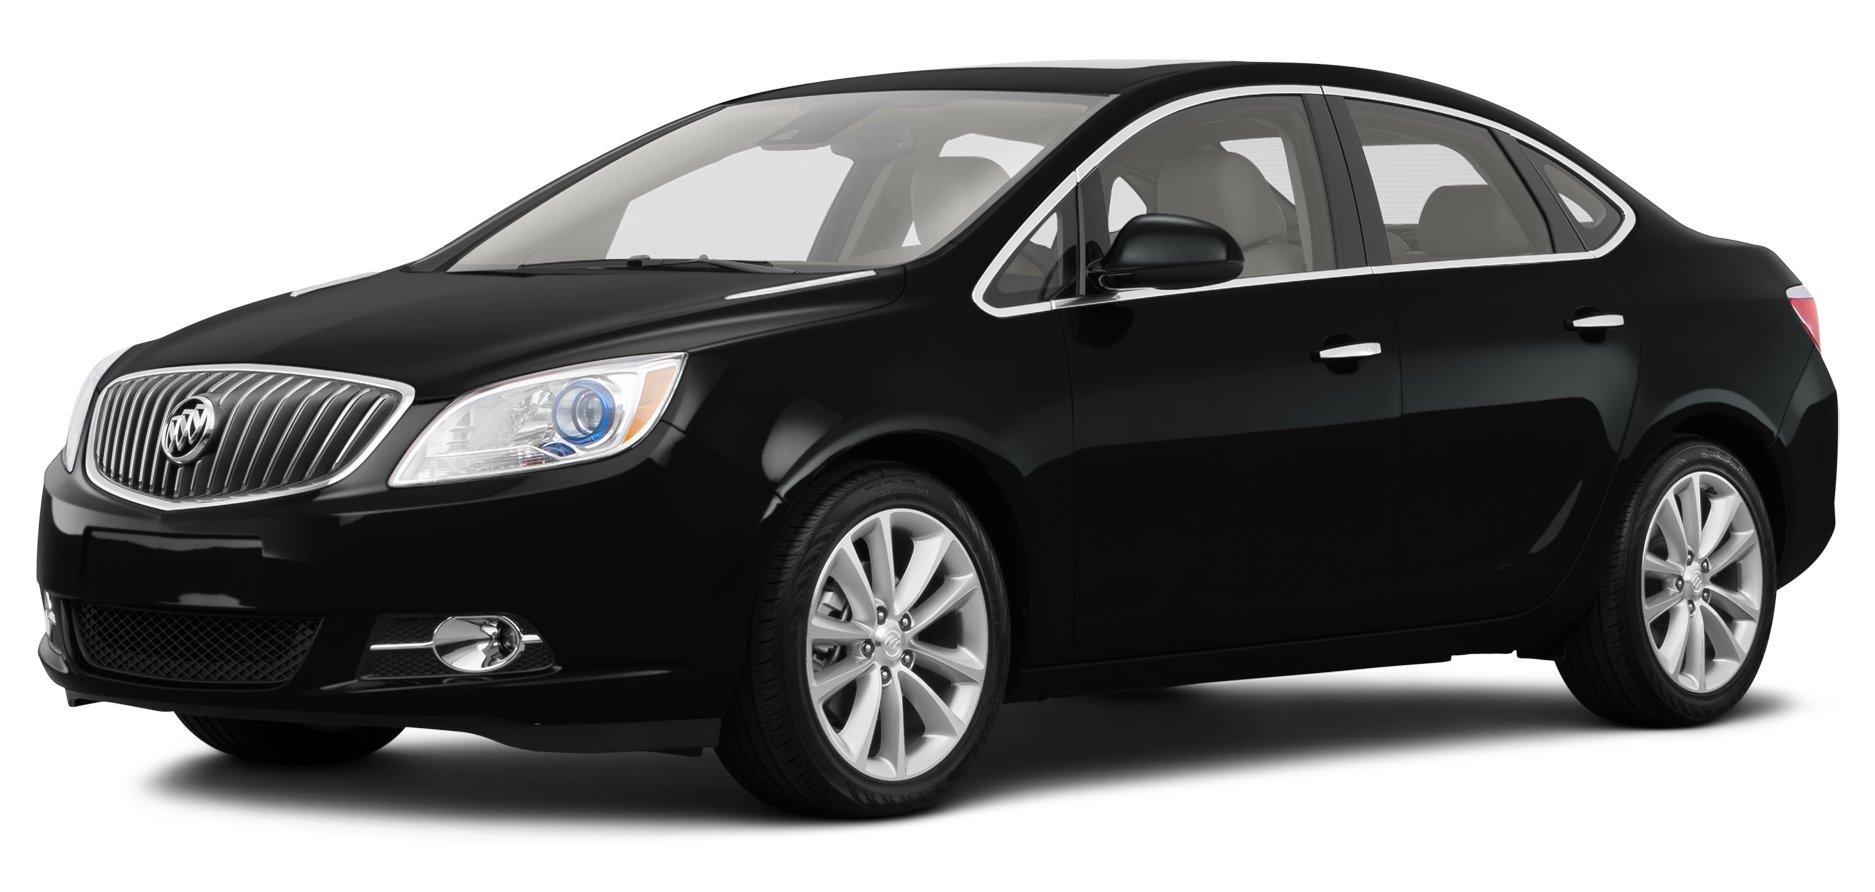 2015 Ford Focus Reviews Images And Specs Vehicles Buick Verano Wiring Diagram Premium Turbo Group 4 Door Sedan